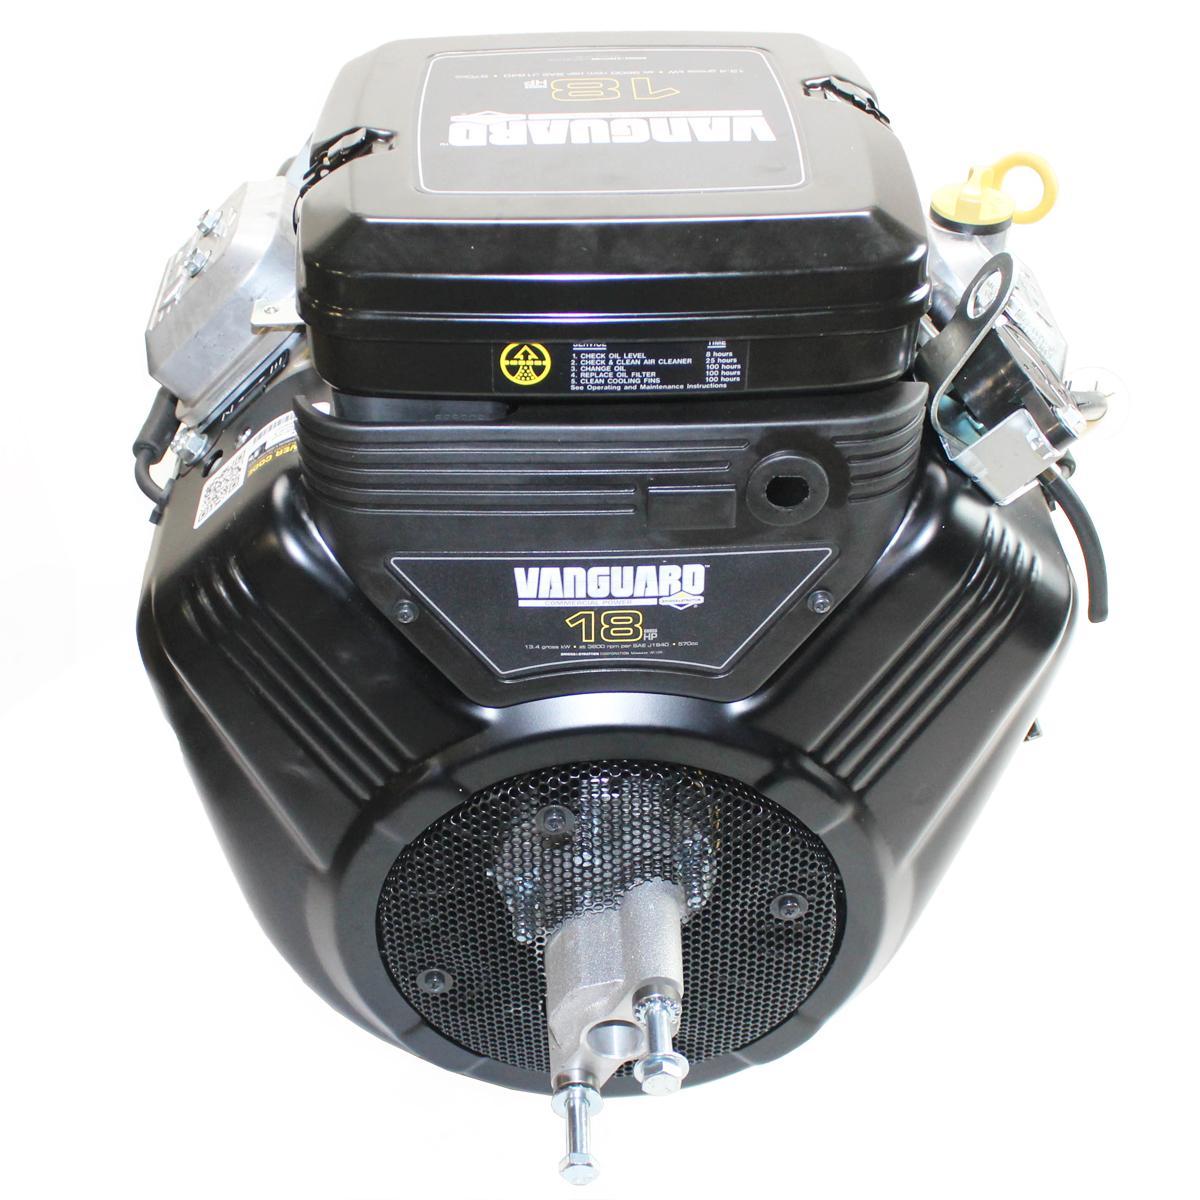 "18hp HOR 1"" Shaft, Vanguard, Conversion kit fits Simplicity 7112, 7117, 7119, AC 912, 916, 917,919 Briggs & Stratton Engine, Thi"